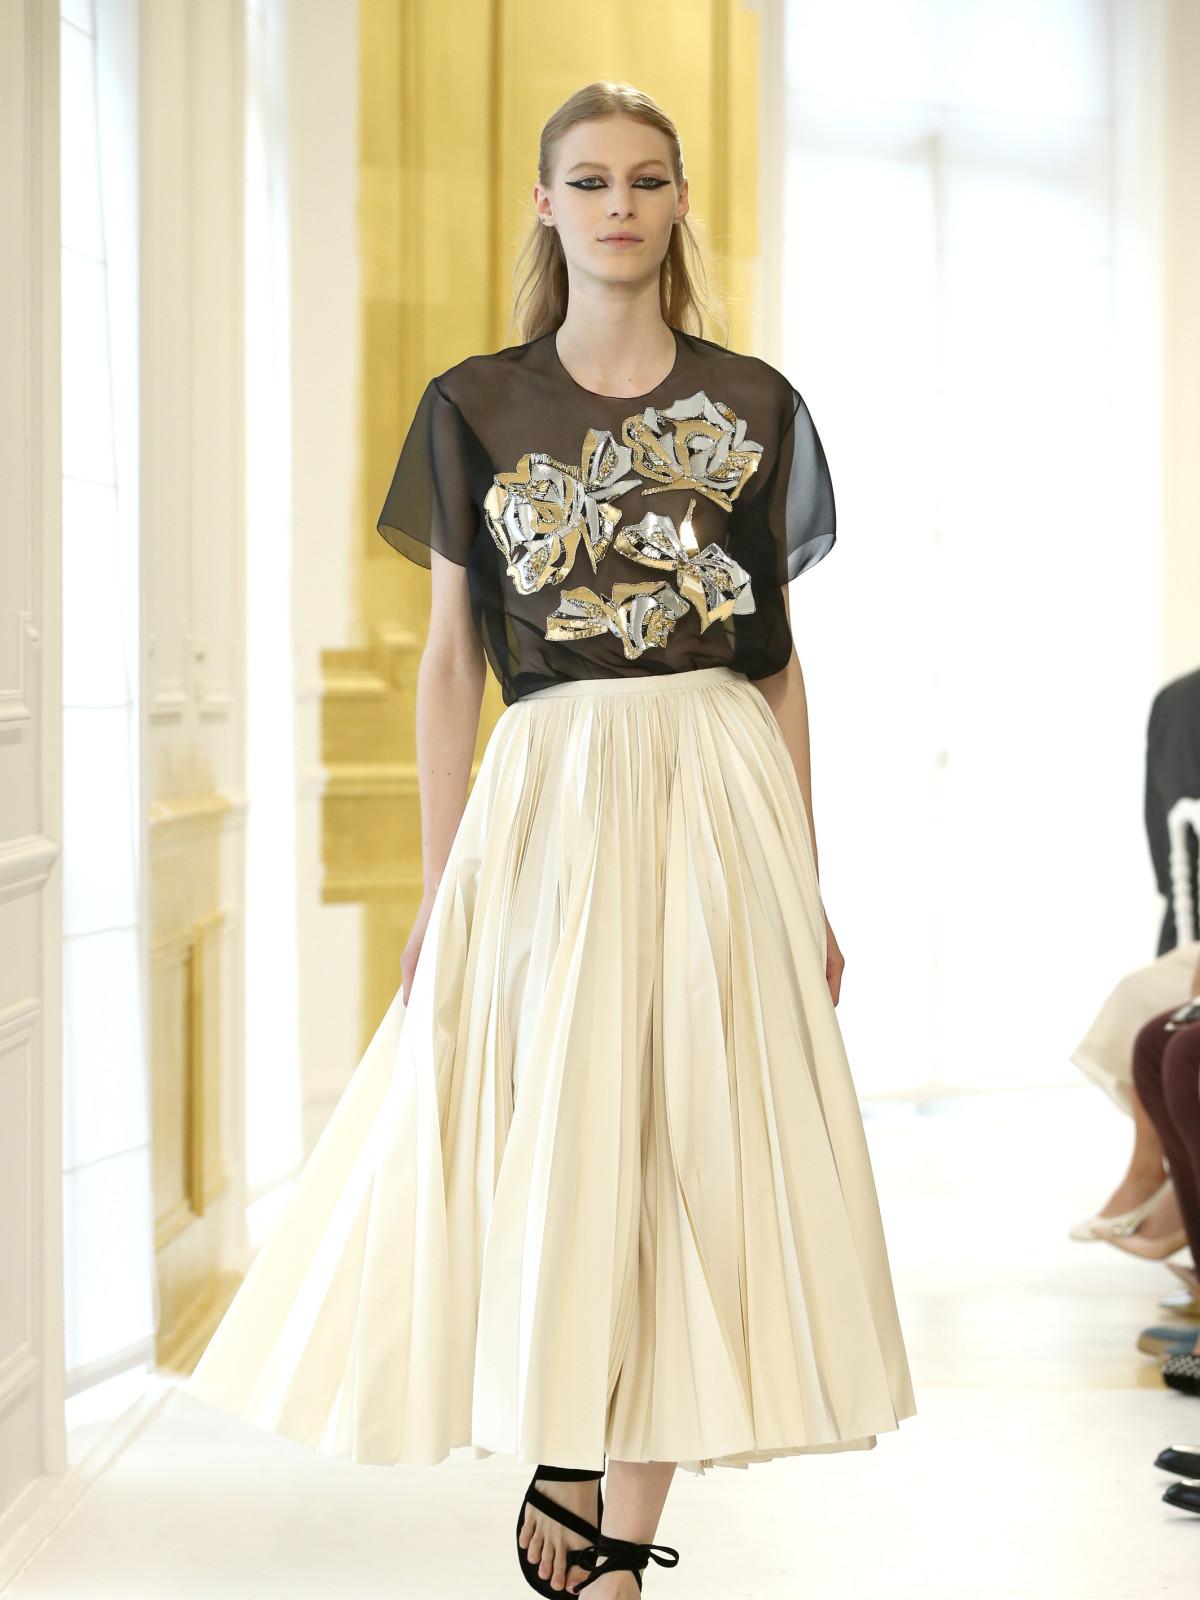 Dior haute couture runway show Paris finale look 45